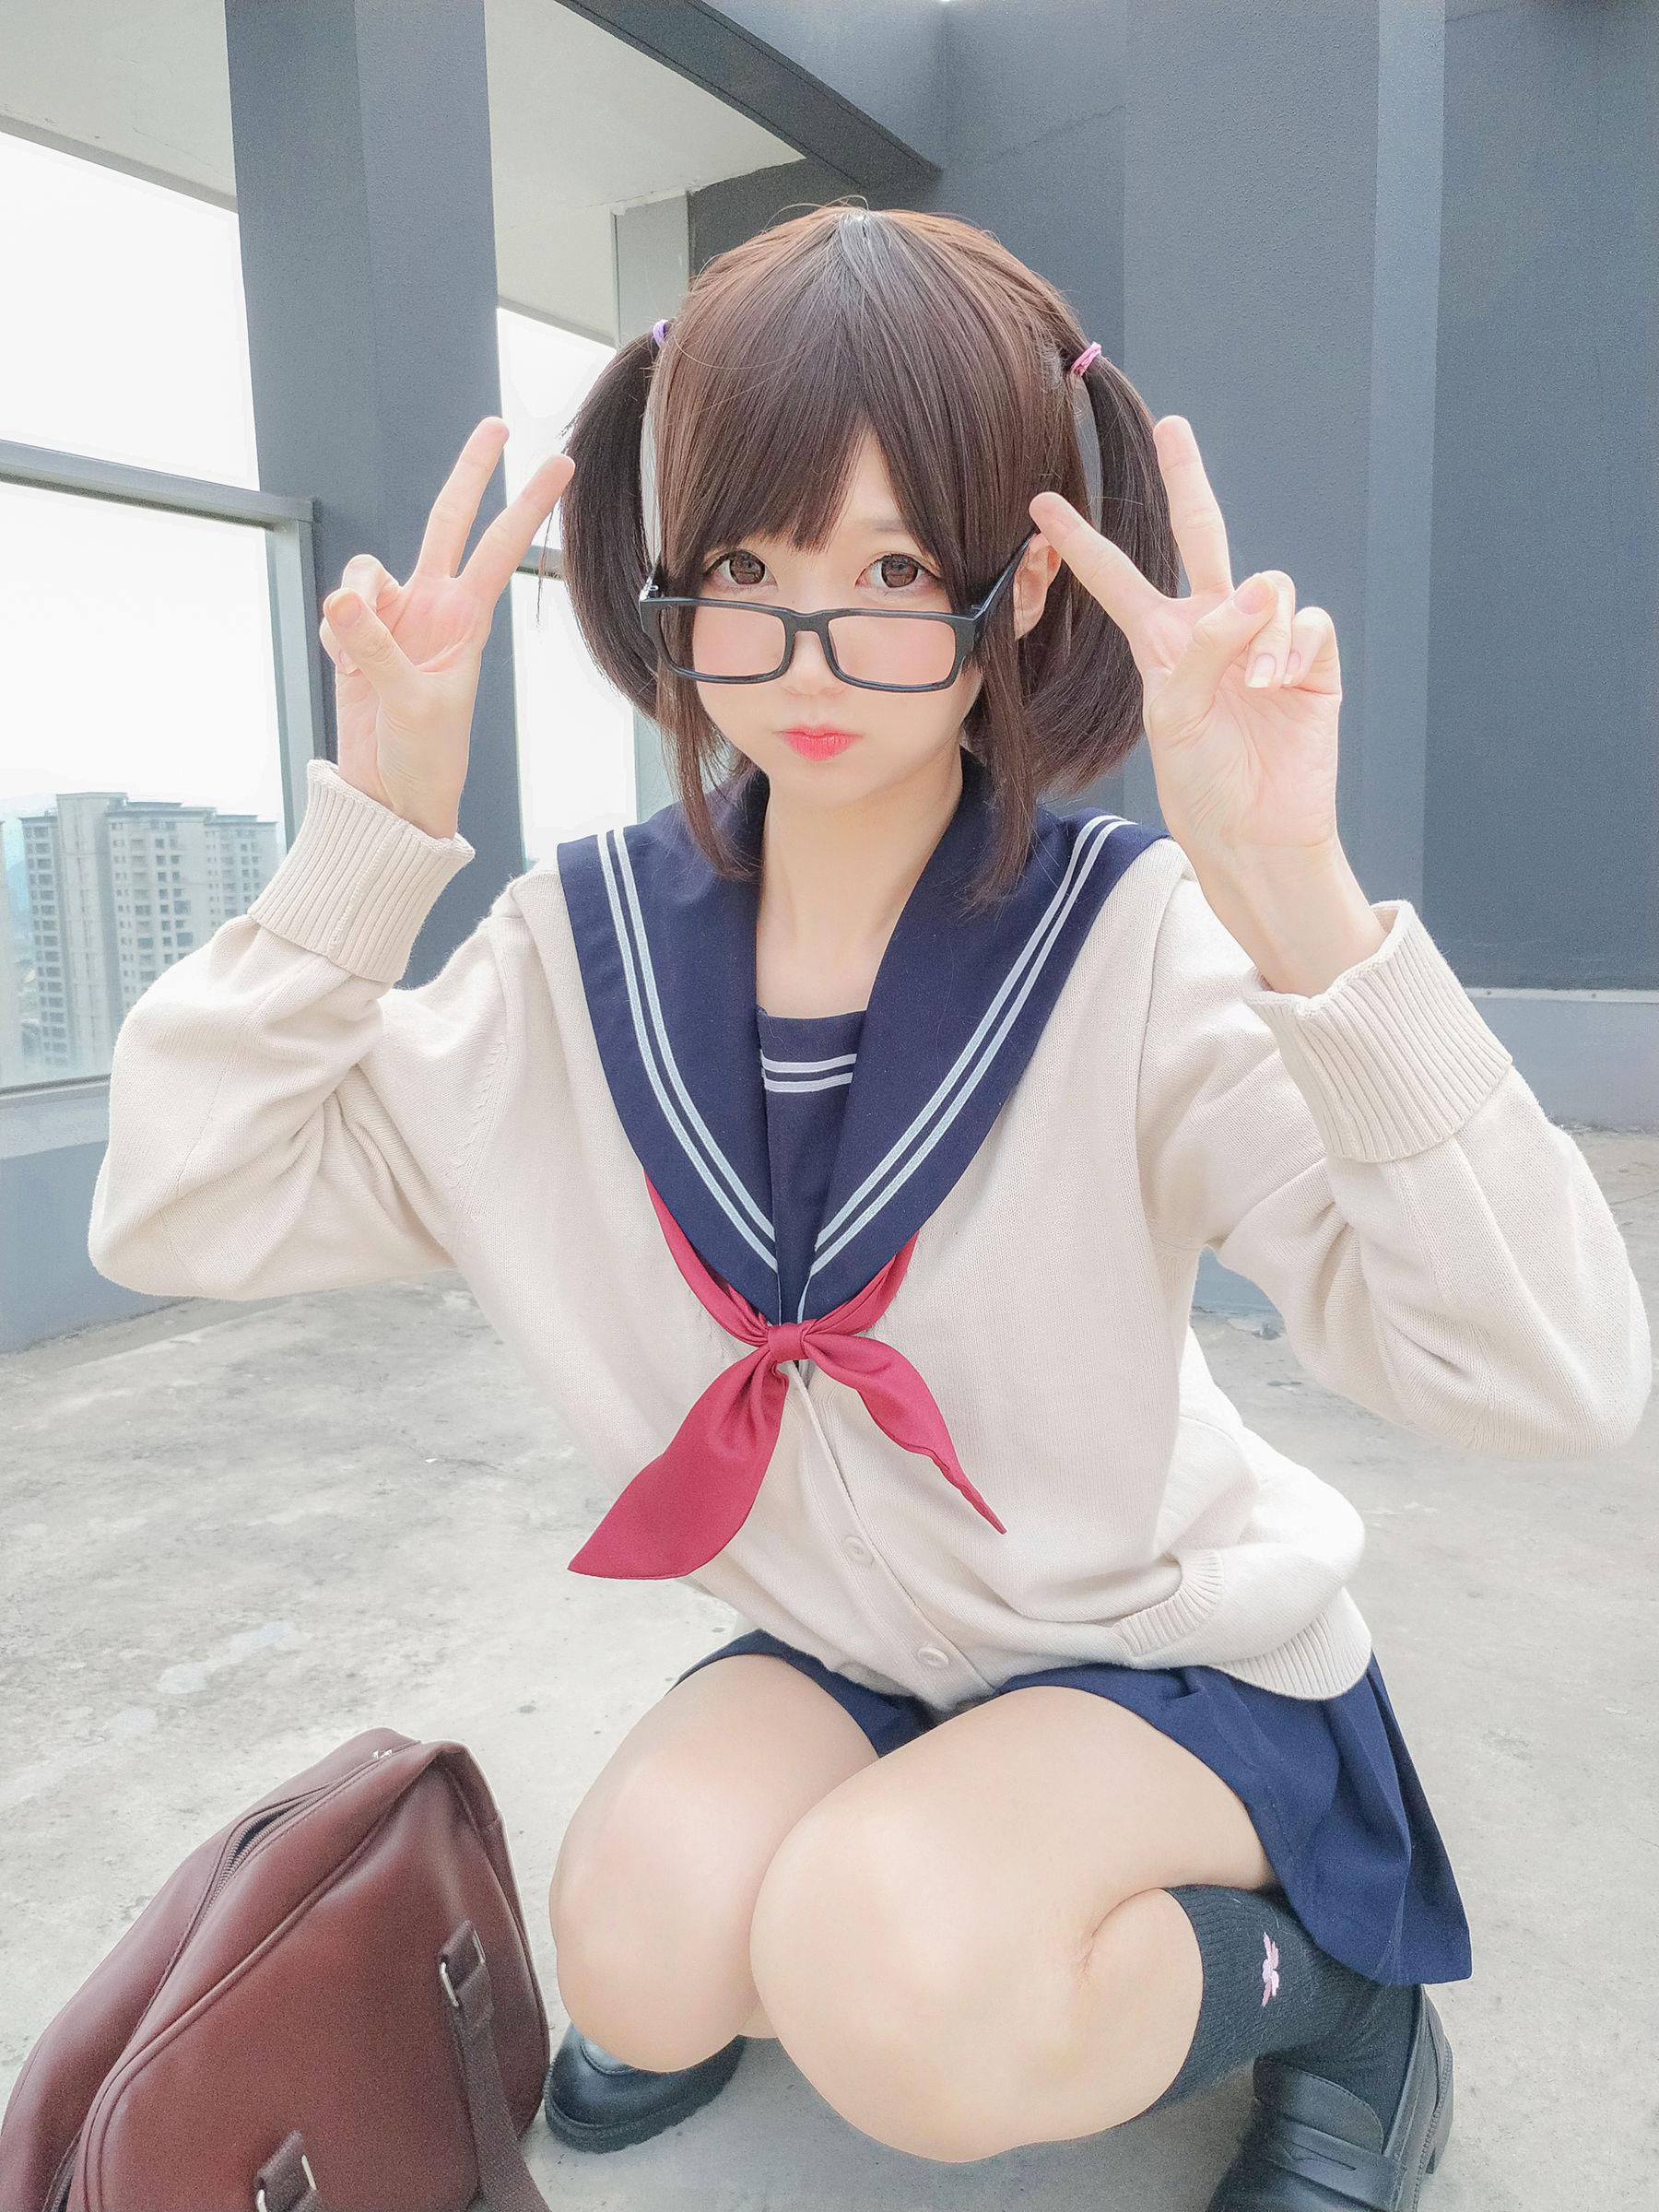 [Cosplay写真] NAGISA魔物喵 - 海军JK风